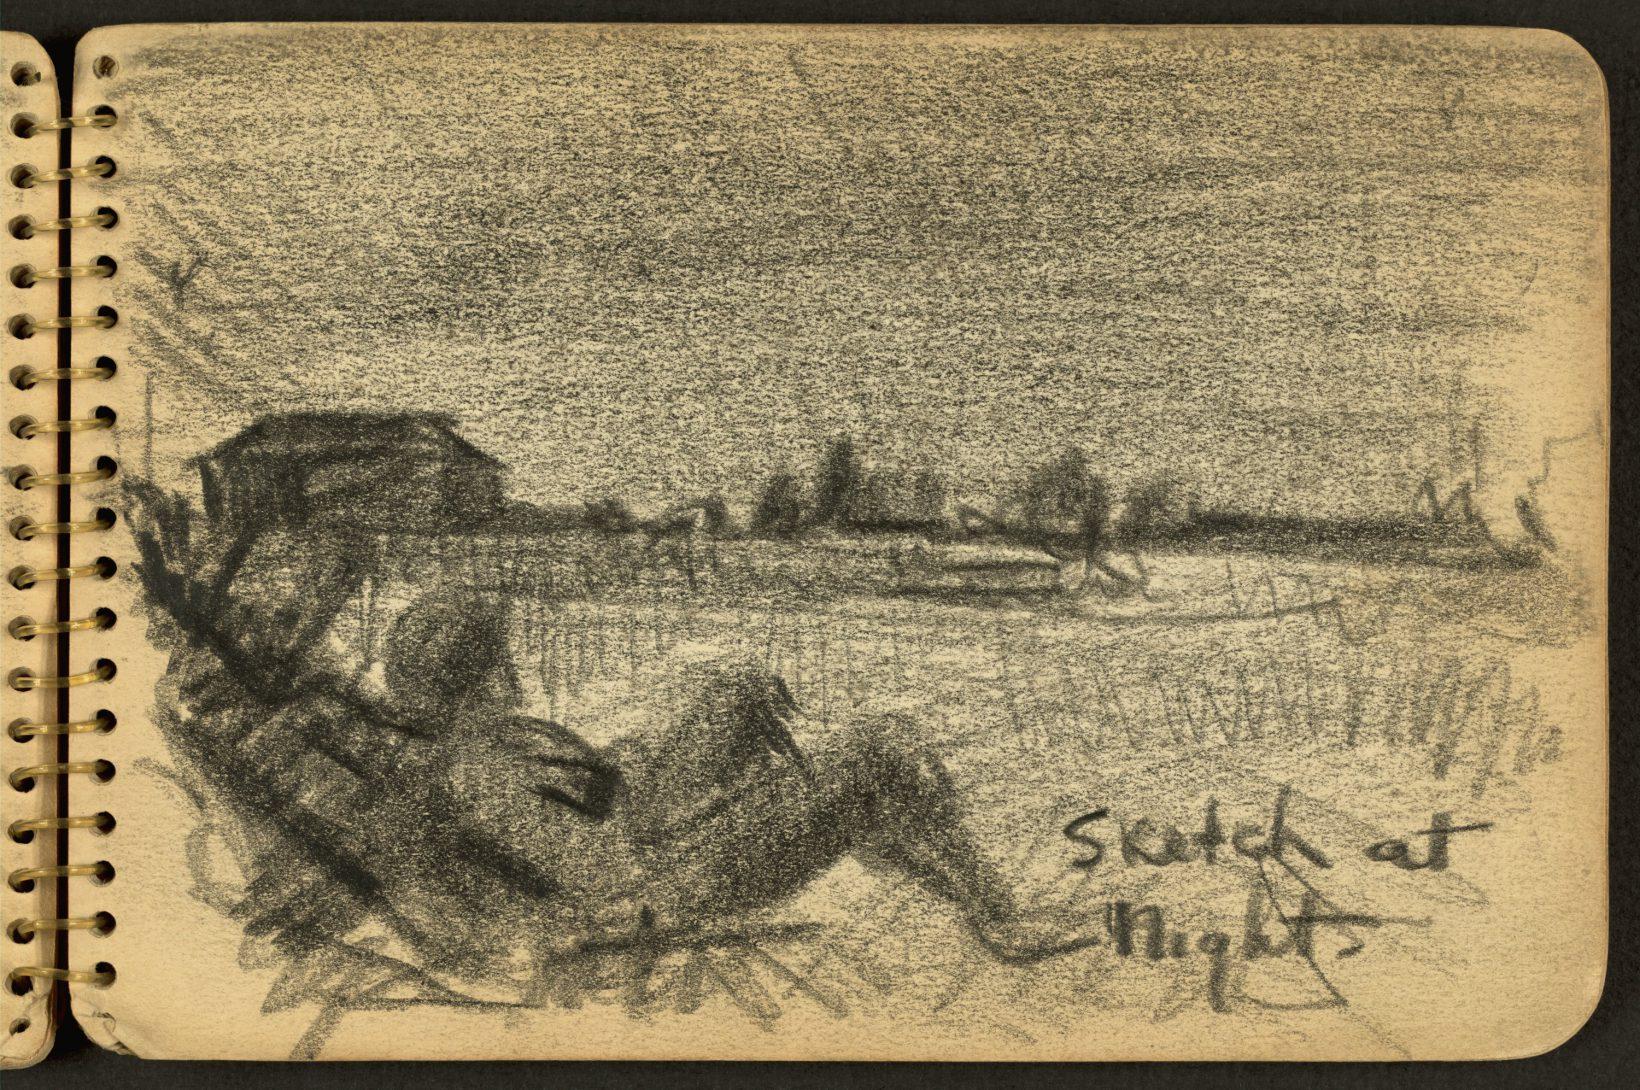 victor-lundy-carnet-croquis-seconde-guerre-mondiale-10